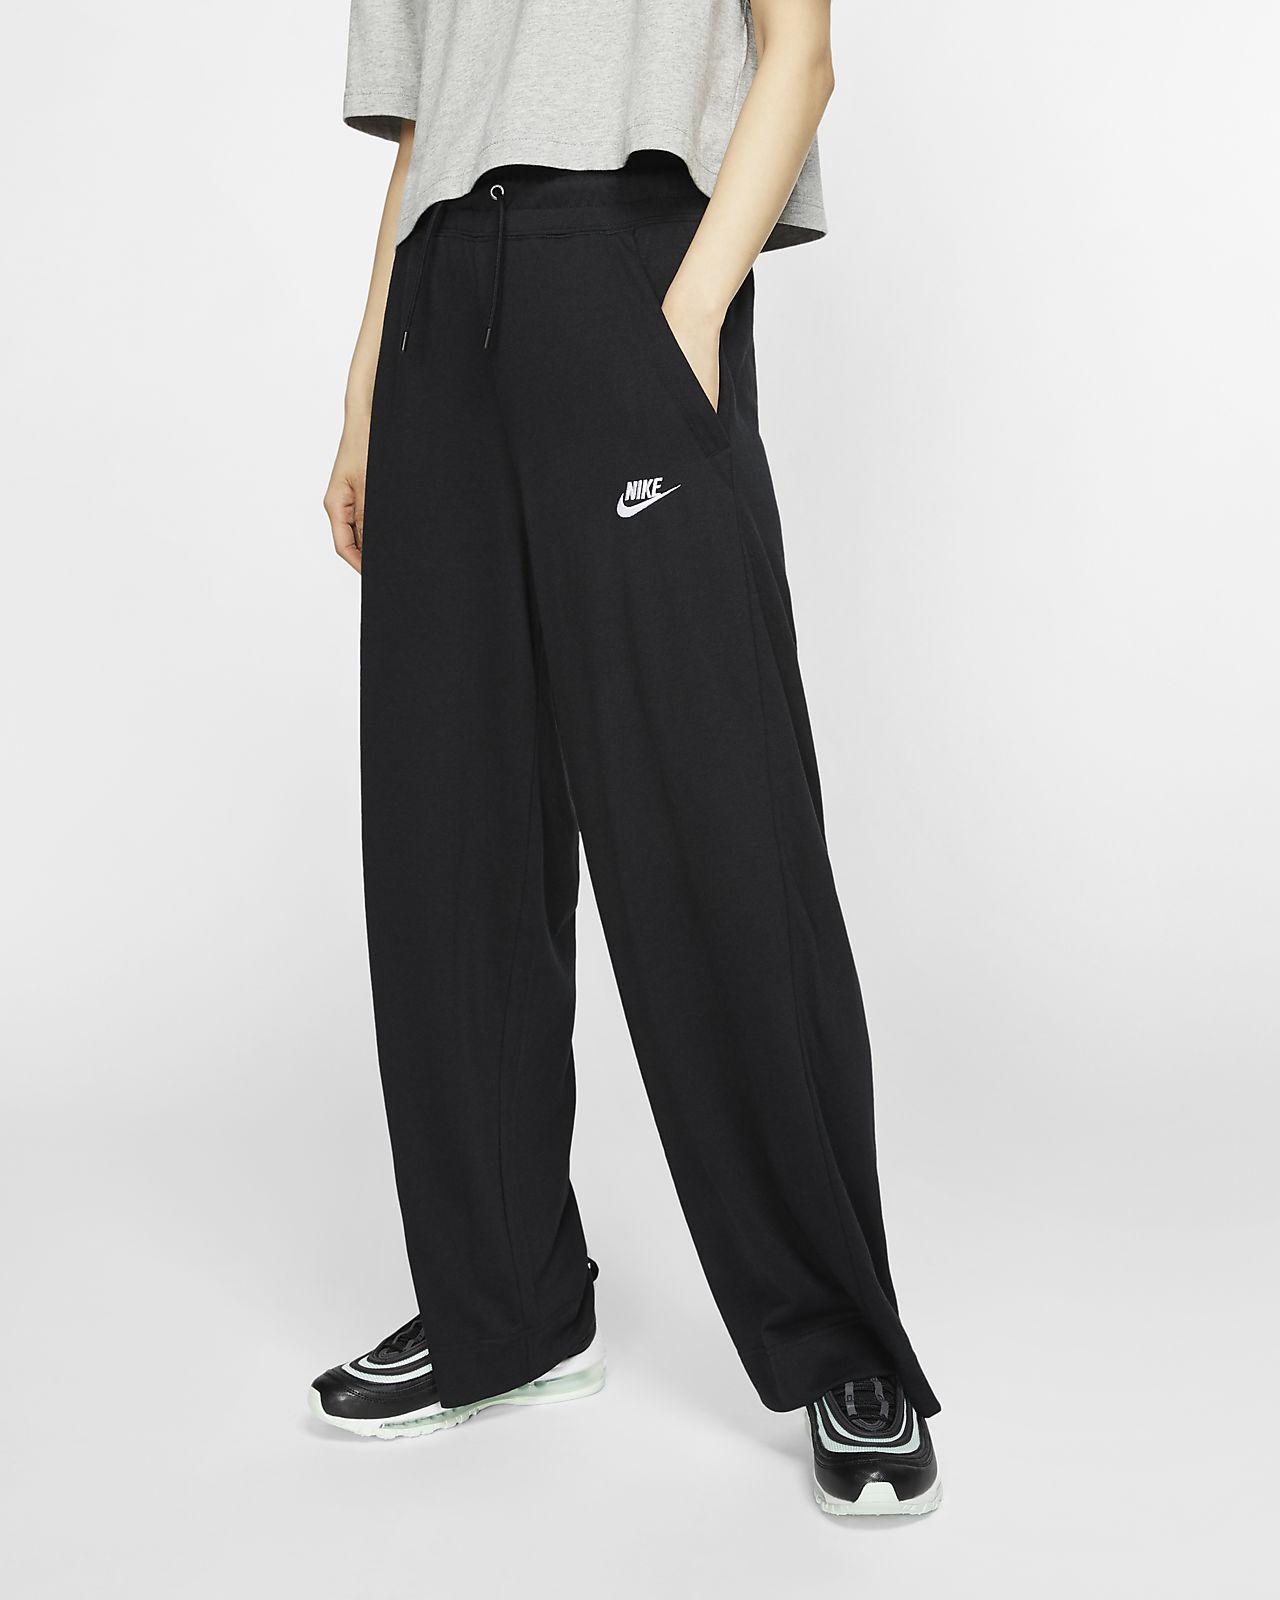 Calças de malha Jersey Nike Sportswear para mulher